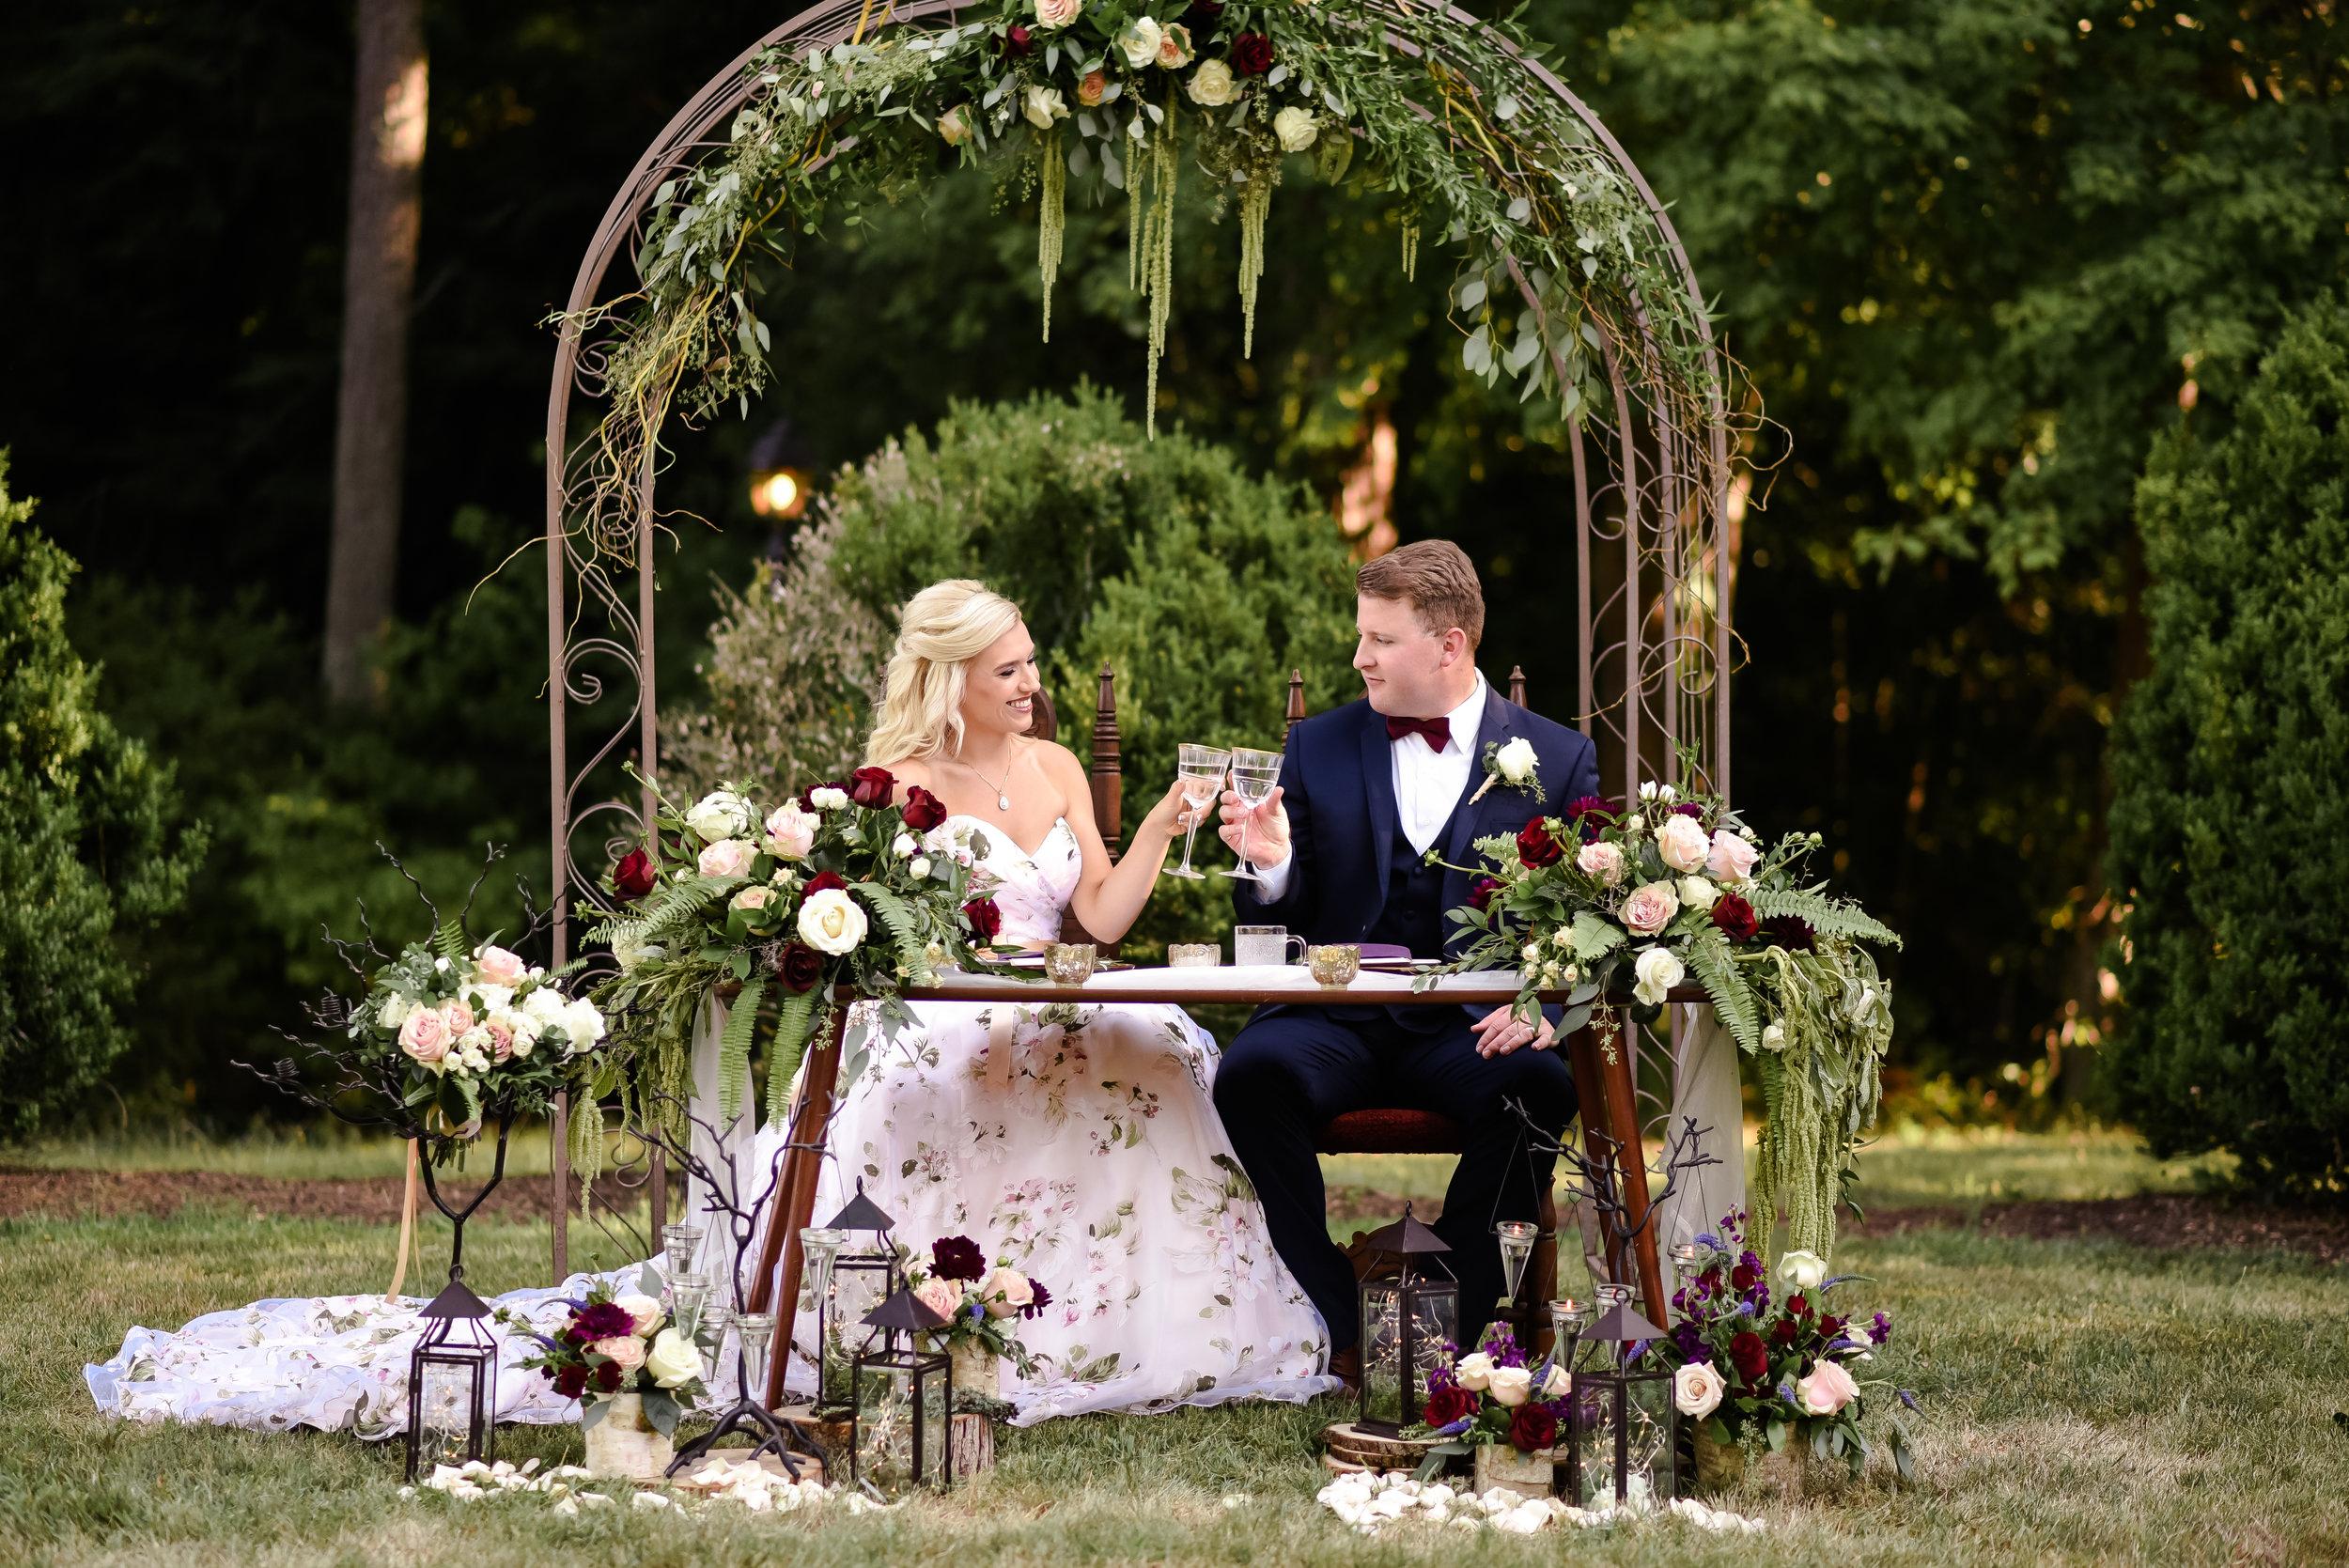 midsummers-eve-wedding-floral-blush-dress-david-tutera-cary-hill-plantation-photo-virginia-bride-136.jpg